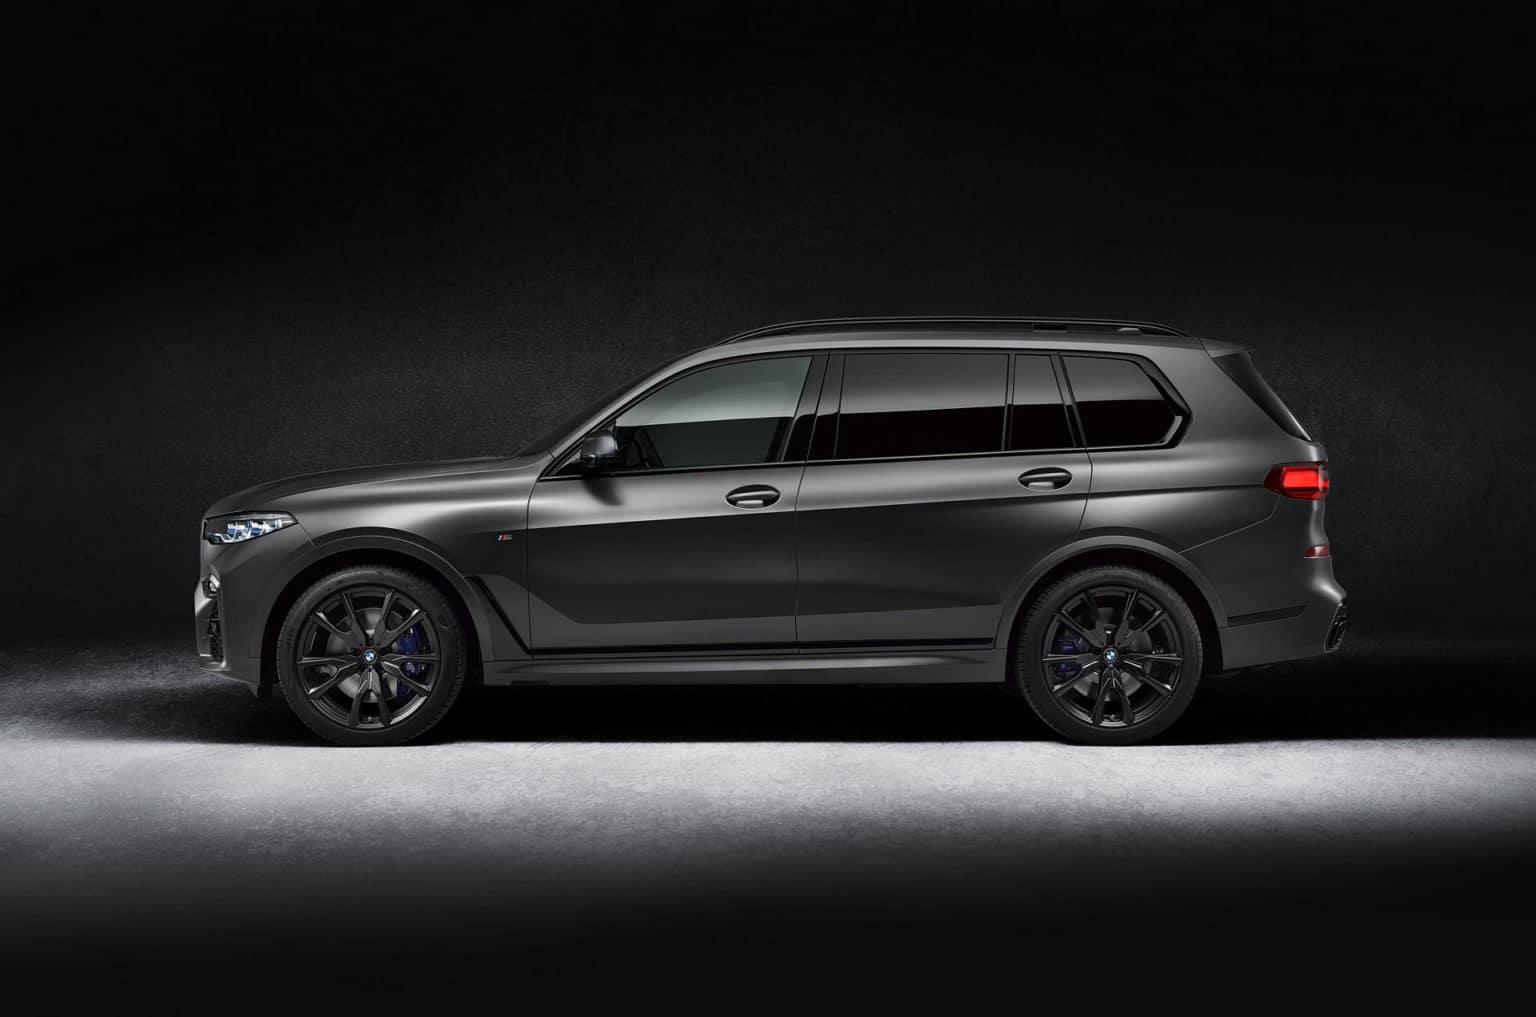 BMW X7 Dark